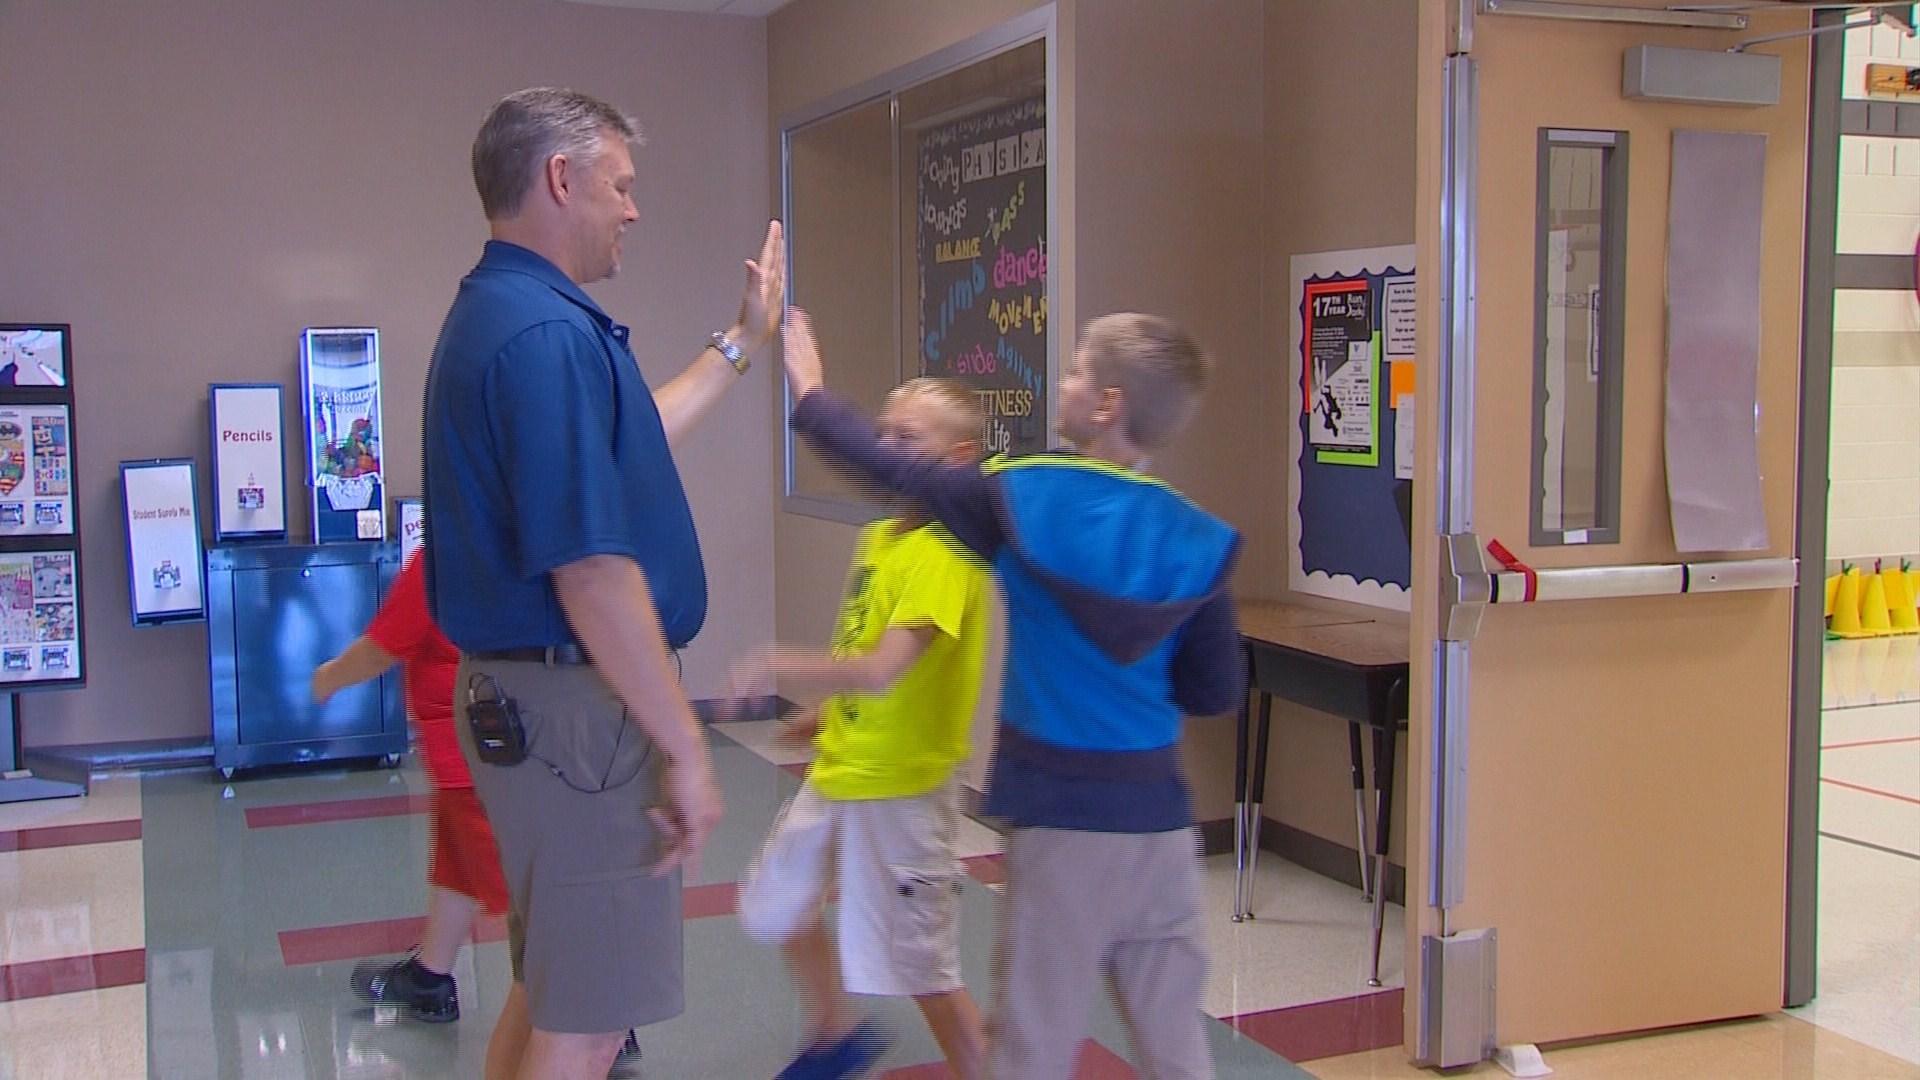 Classroom Pe Ideas ~ Teacher pushes new pe ideas with reduced class time wfaa